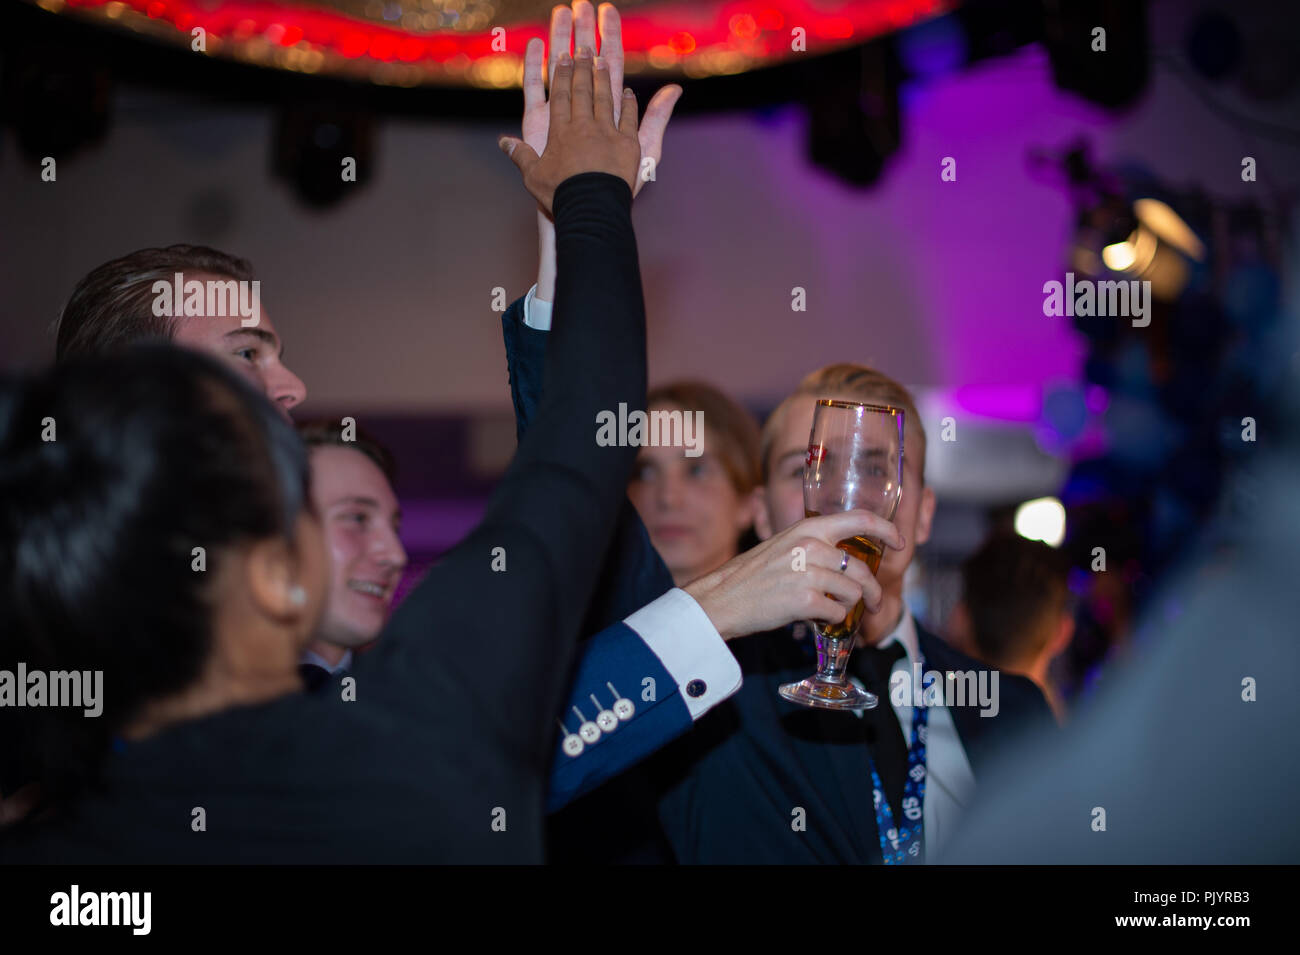 Stockholm, Sweden, September 9, 2018. Swedish General Election 2018.  Election Night Watch Party for Sweden Democrats (SD) in central Stockholm, Sweden. Credit: Barbro Bergfeldt/Alamy Live News Stock Photo